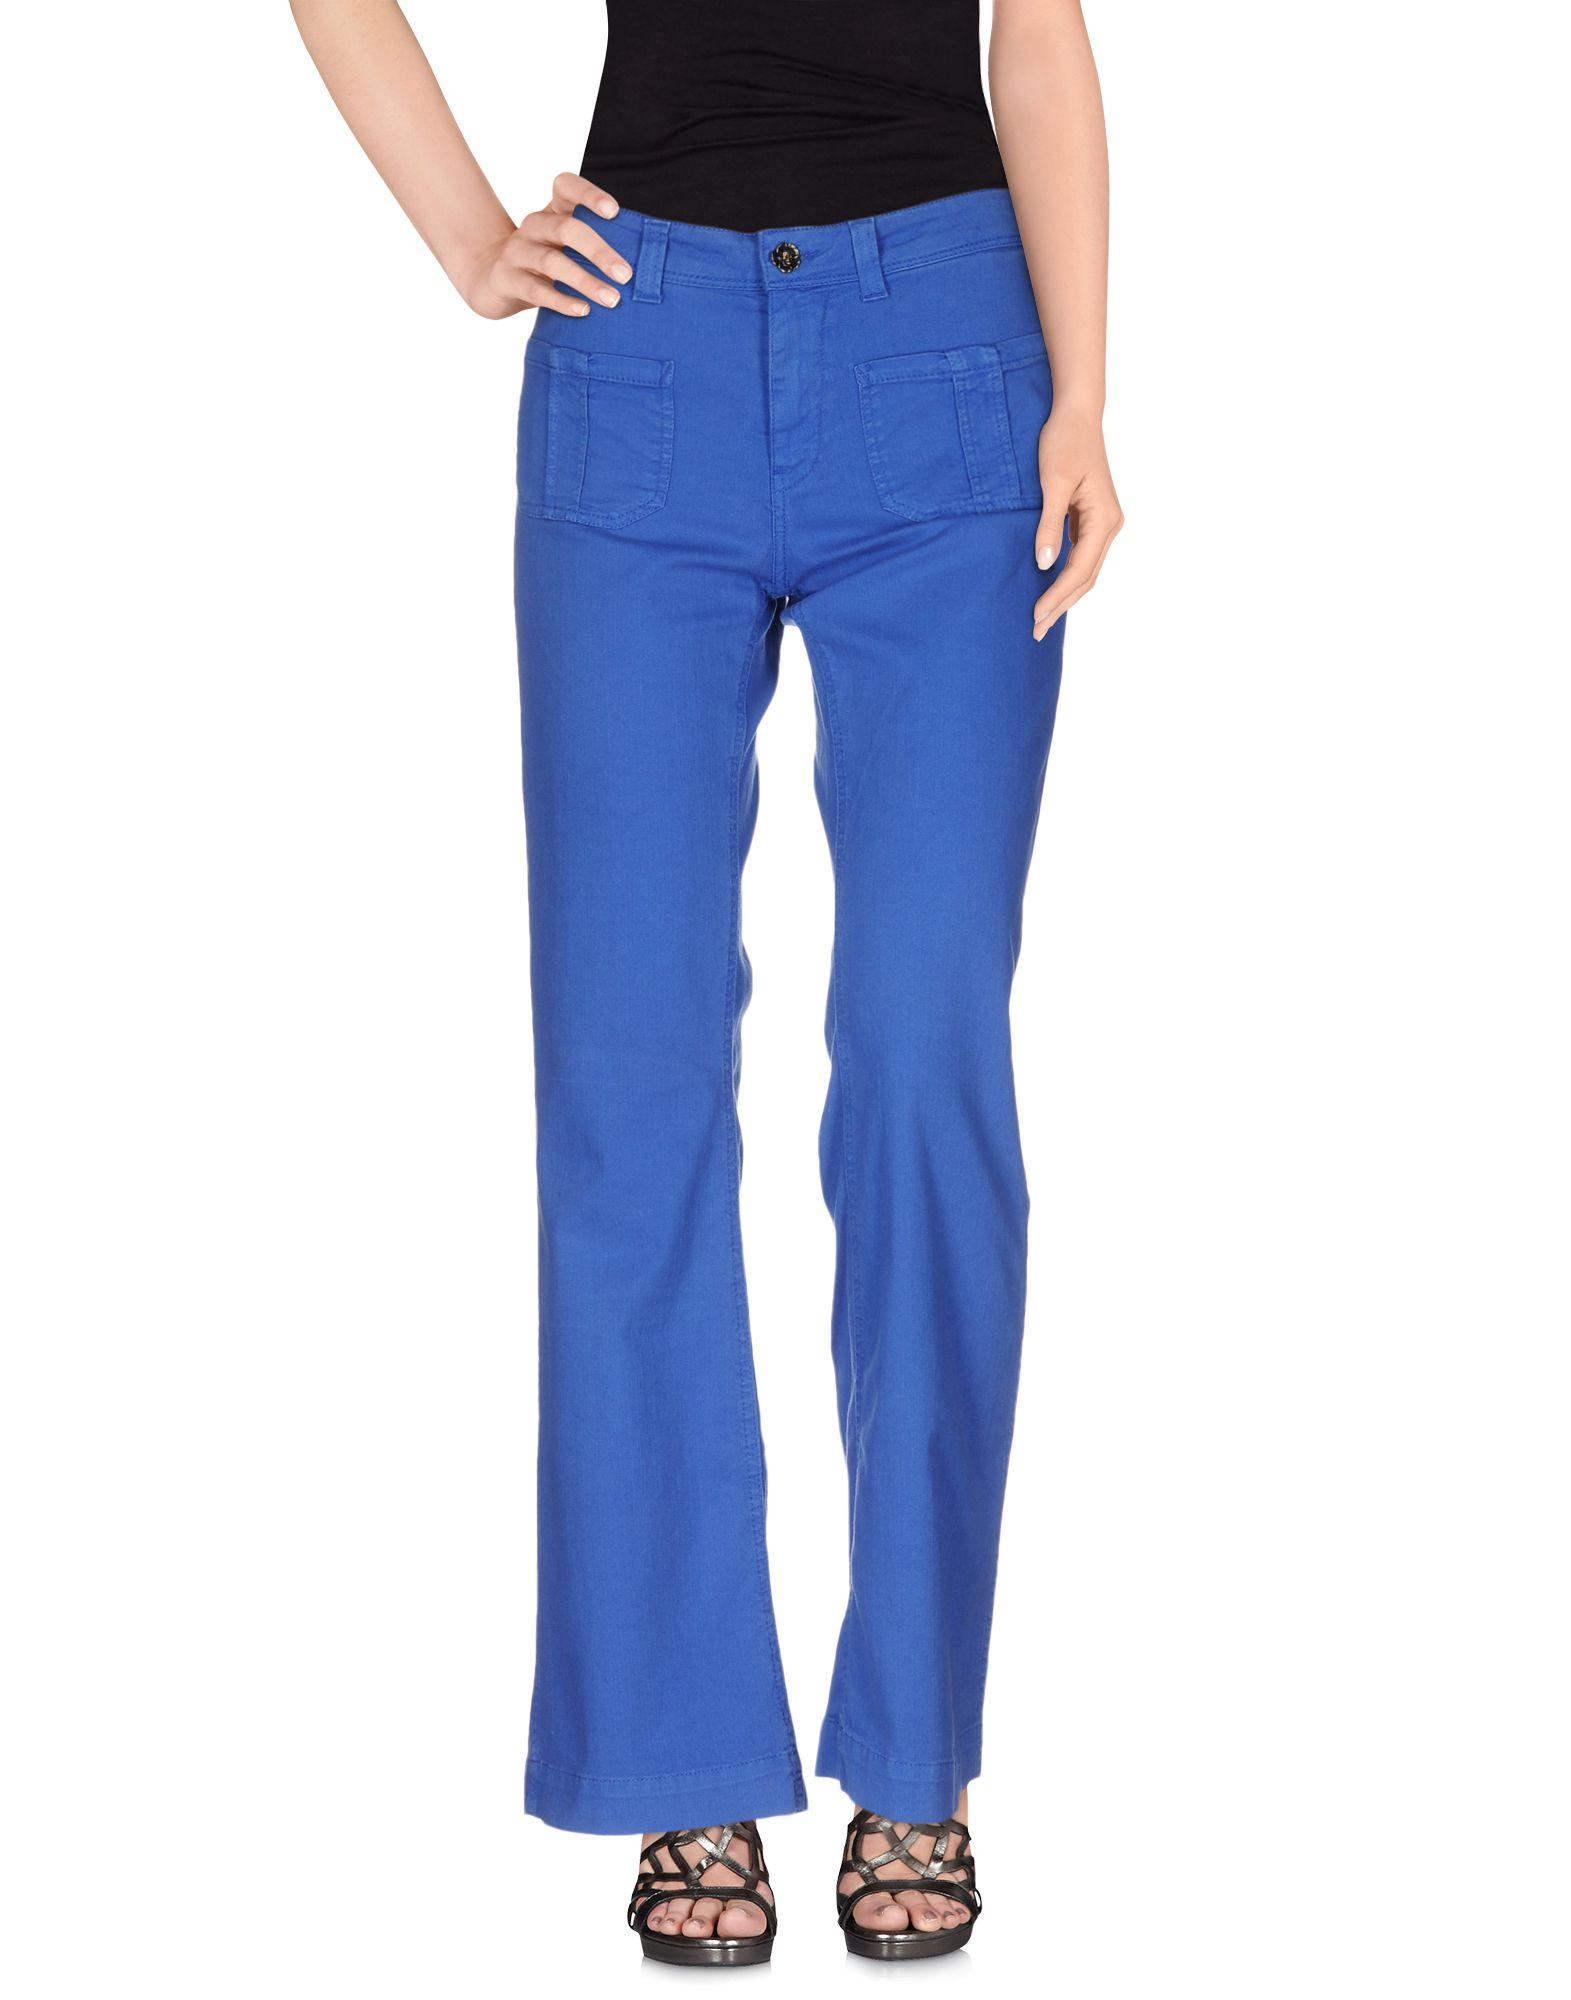 SWILDENS Damen Jeanshose Farbe Königsblau Größe 6